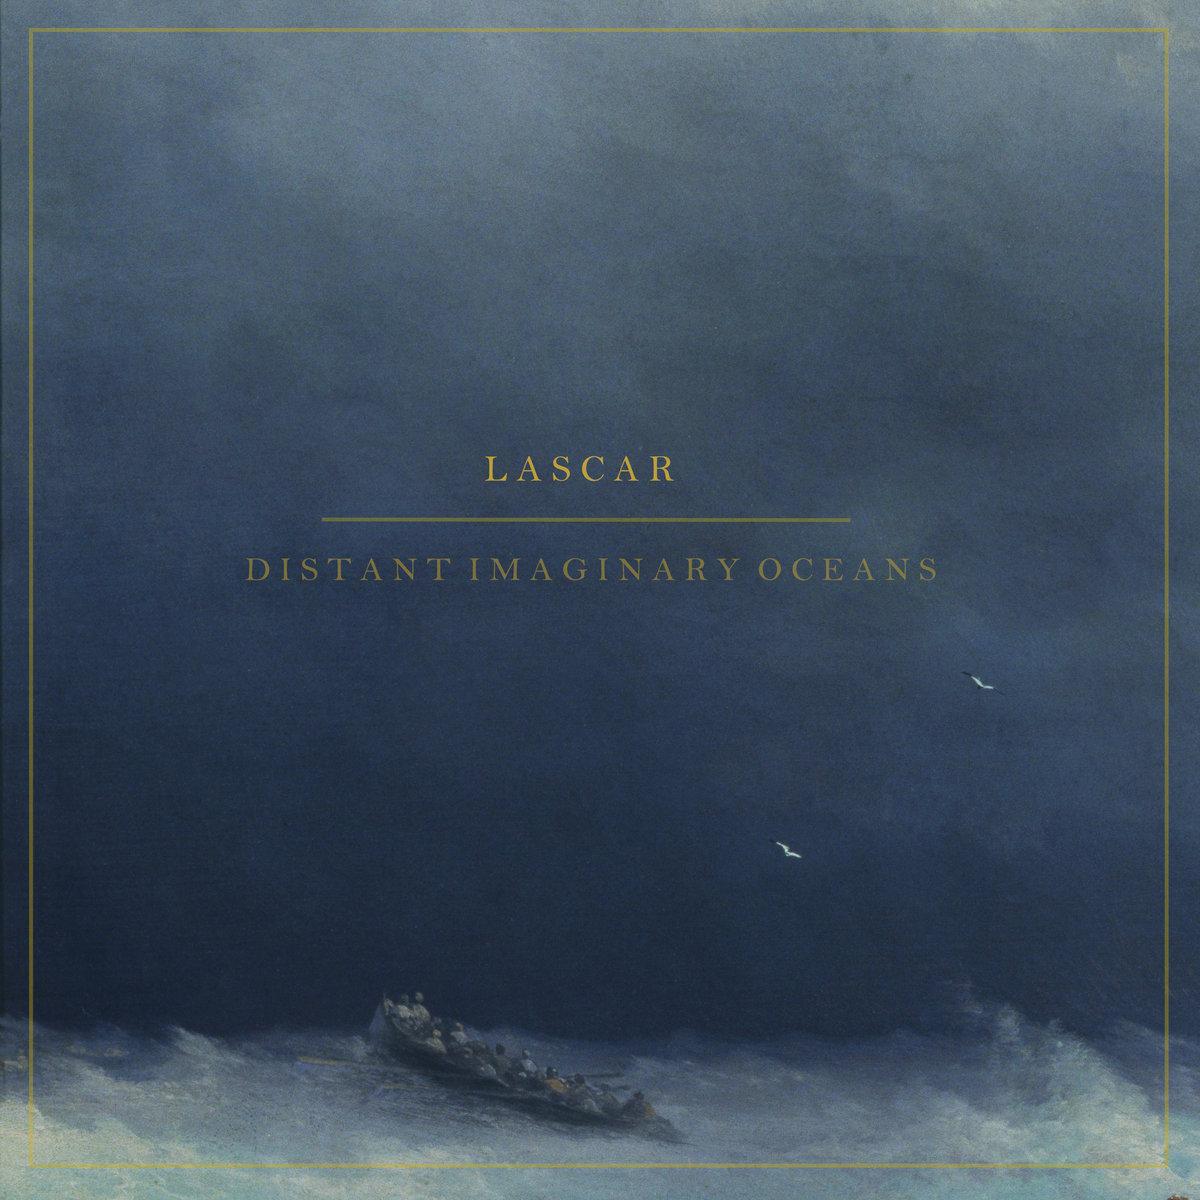 Distant Imaginary Oceans Lascar Cover Art